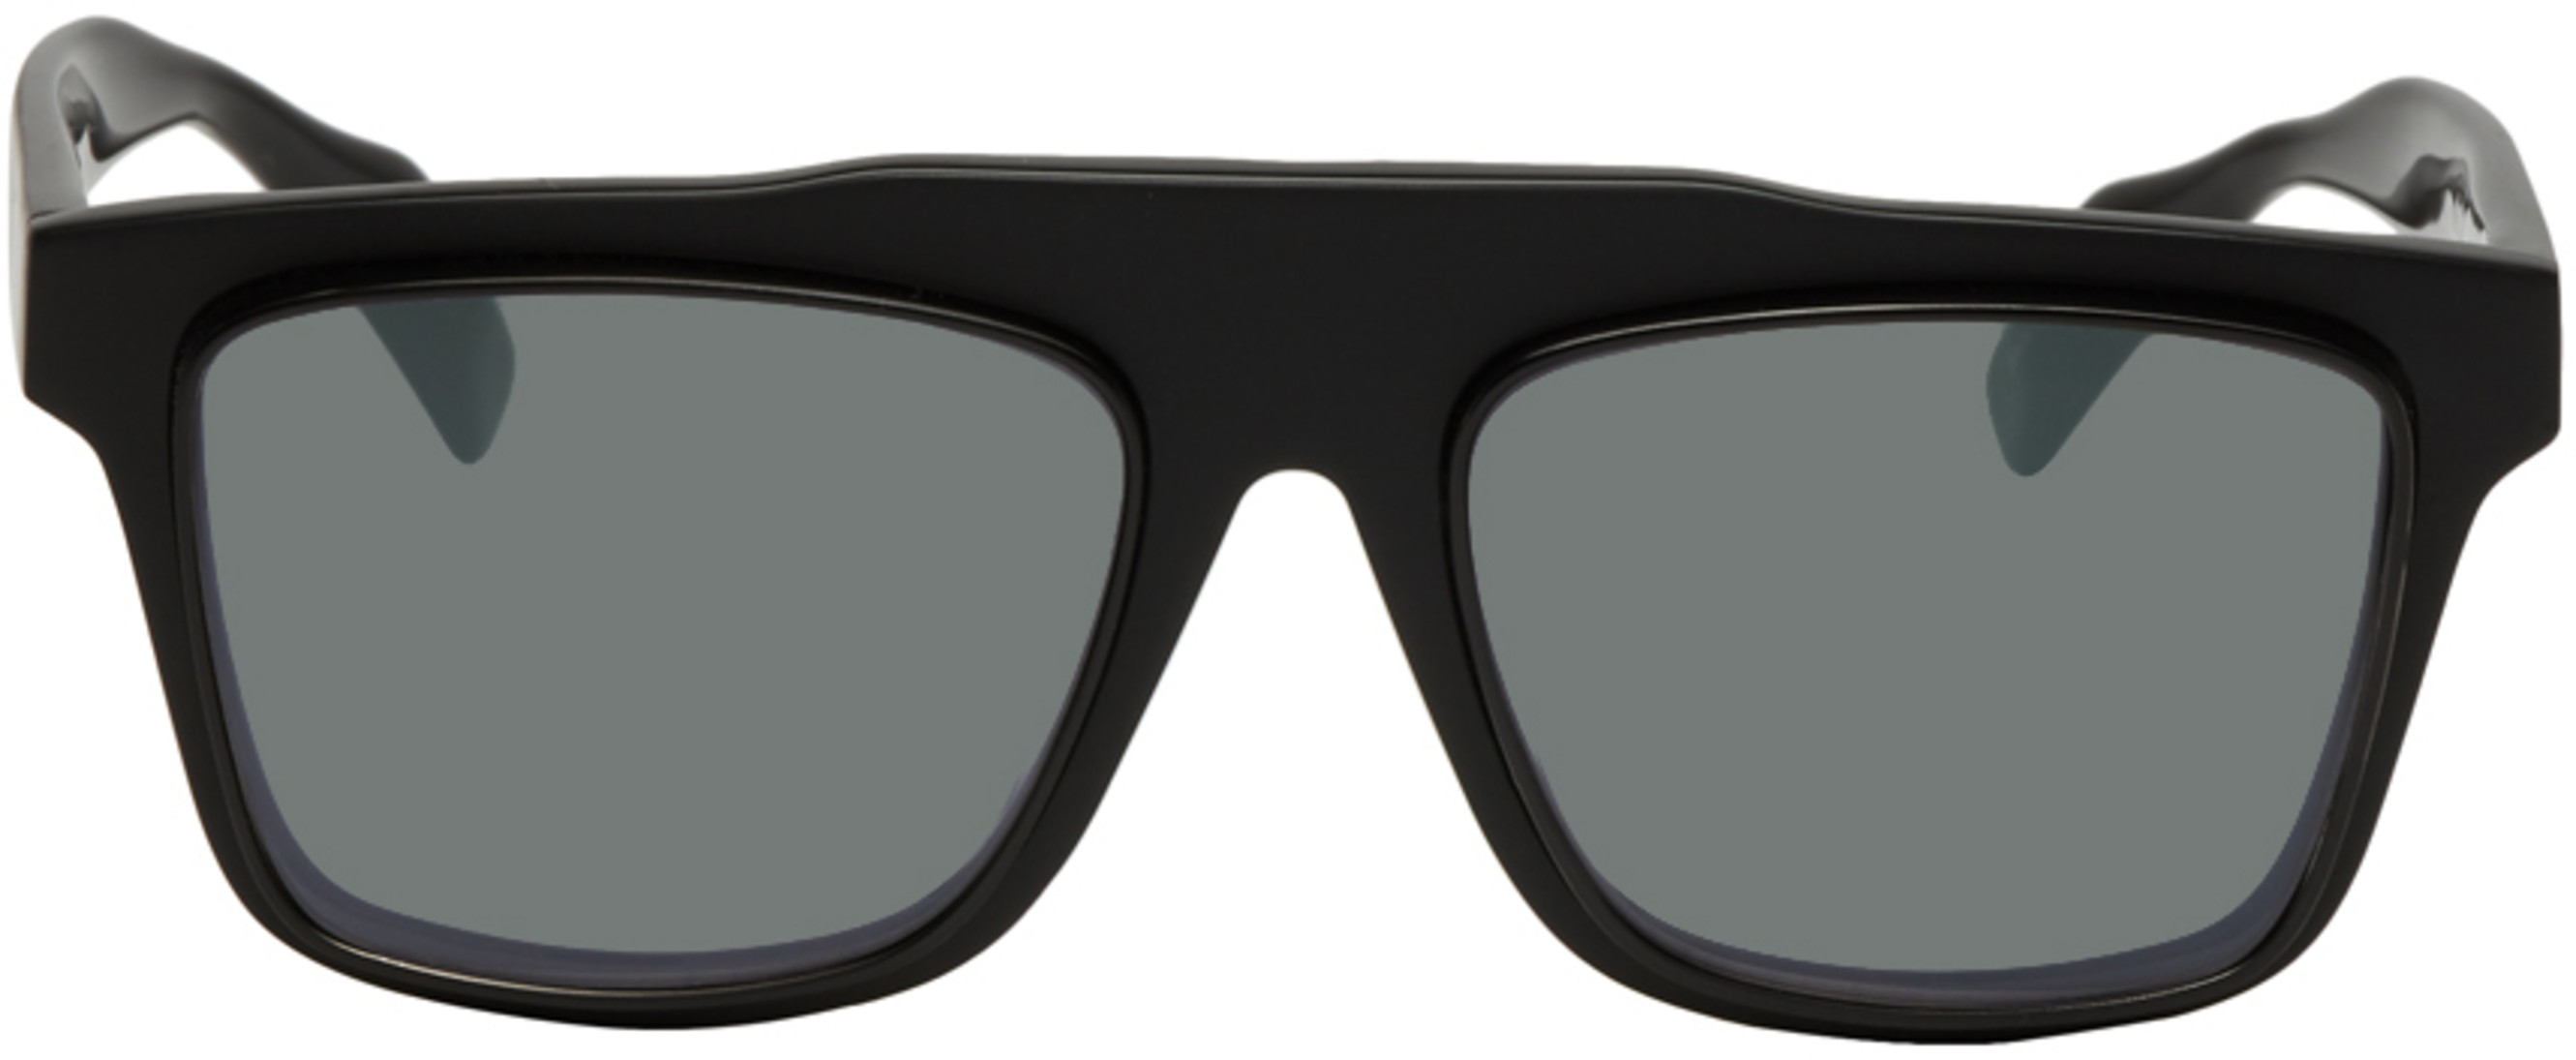 53891220f85 Yohji Yamamoto eyewear for Men